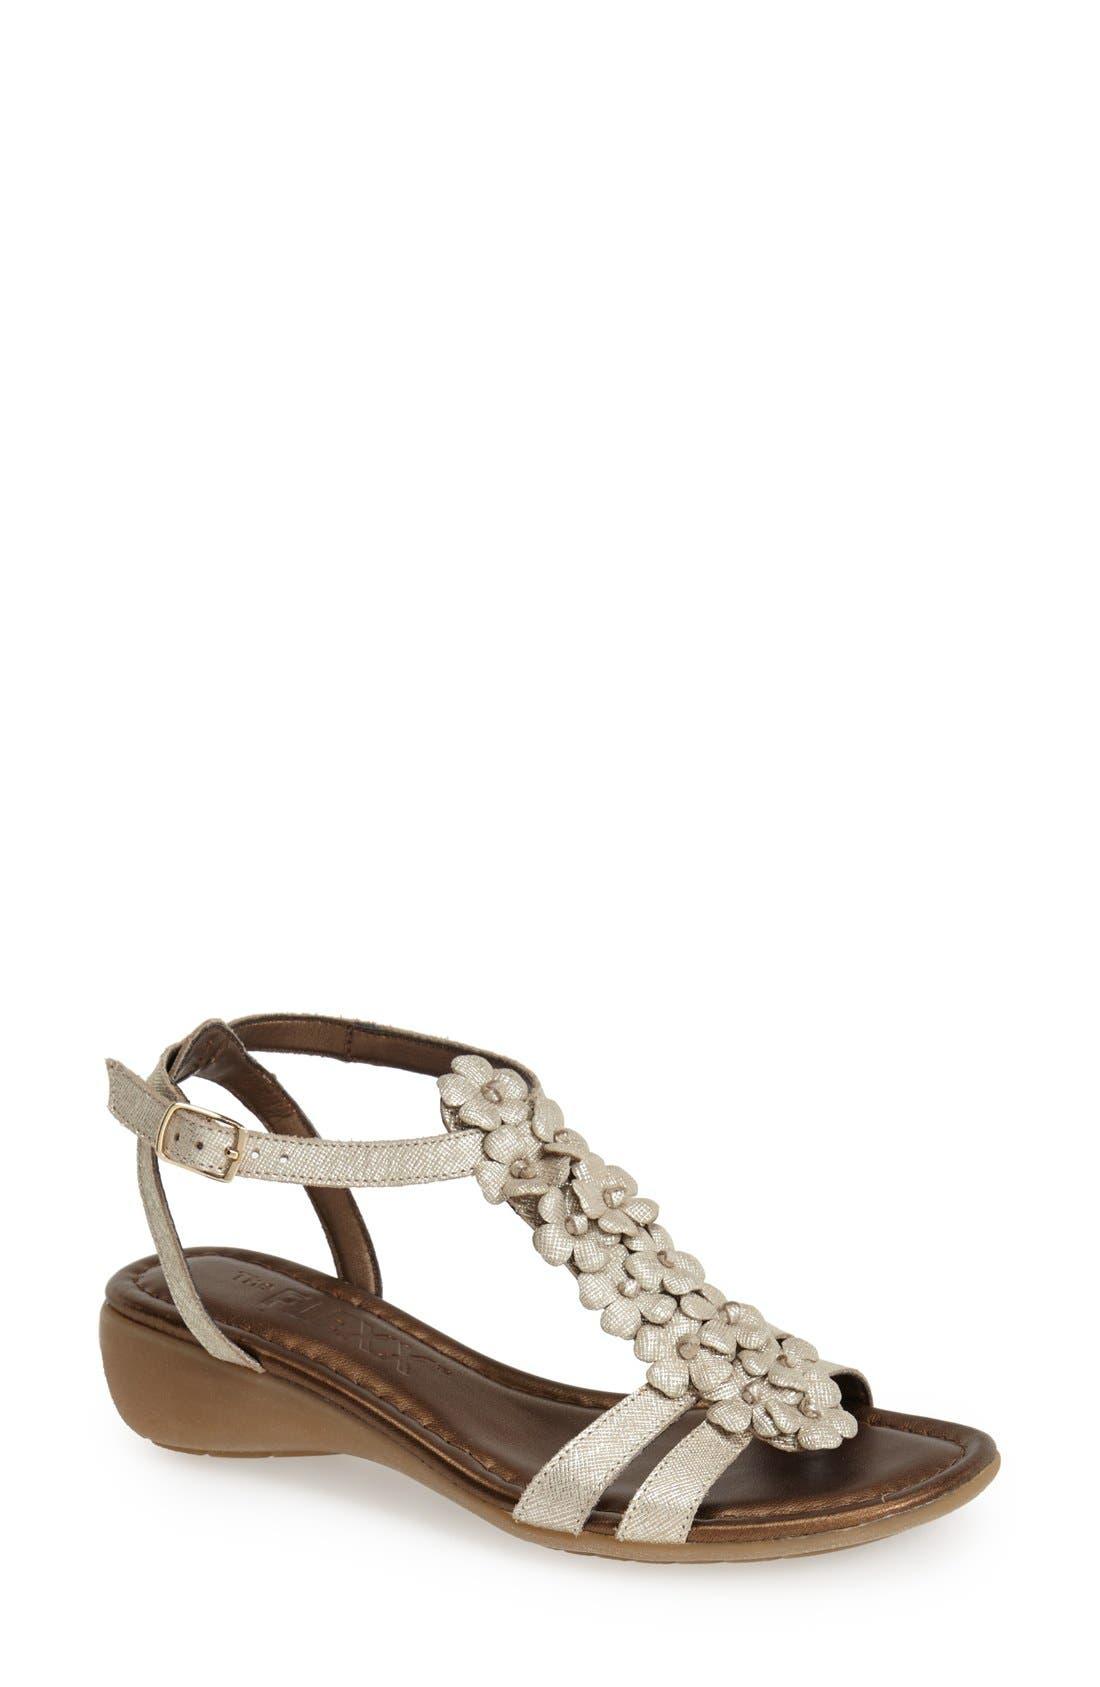 Main Image - The FLEXX 'Gladiola' Leather Sandal (Women)